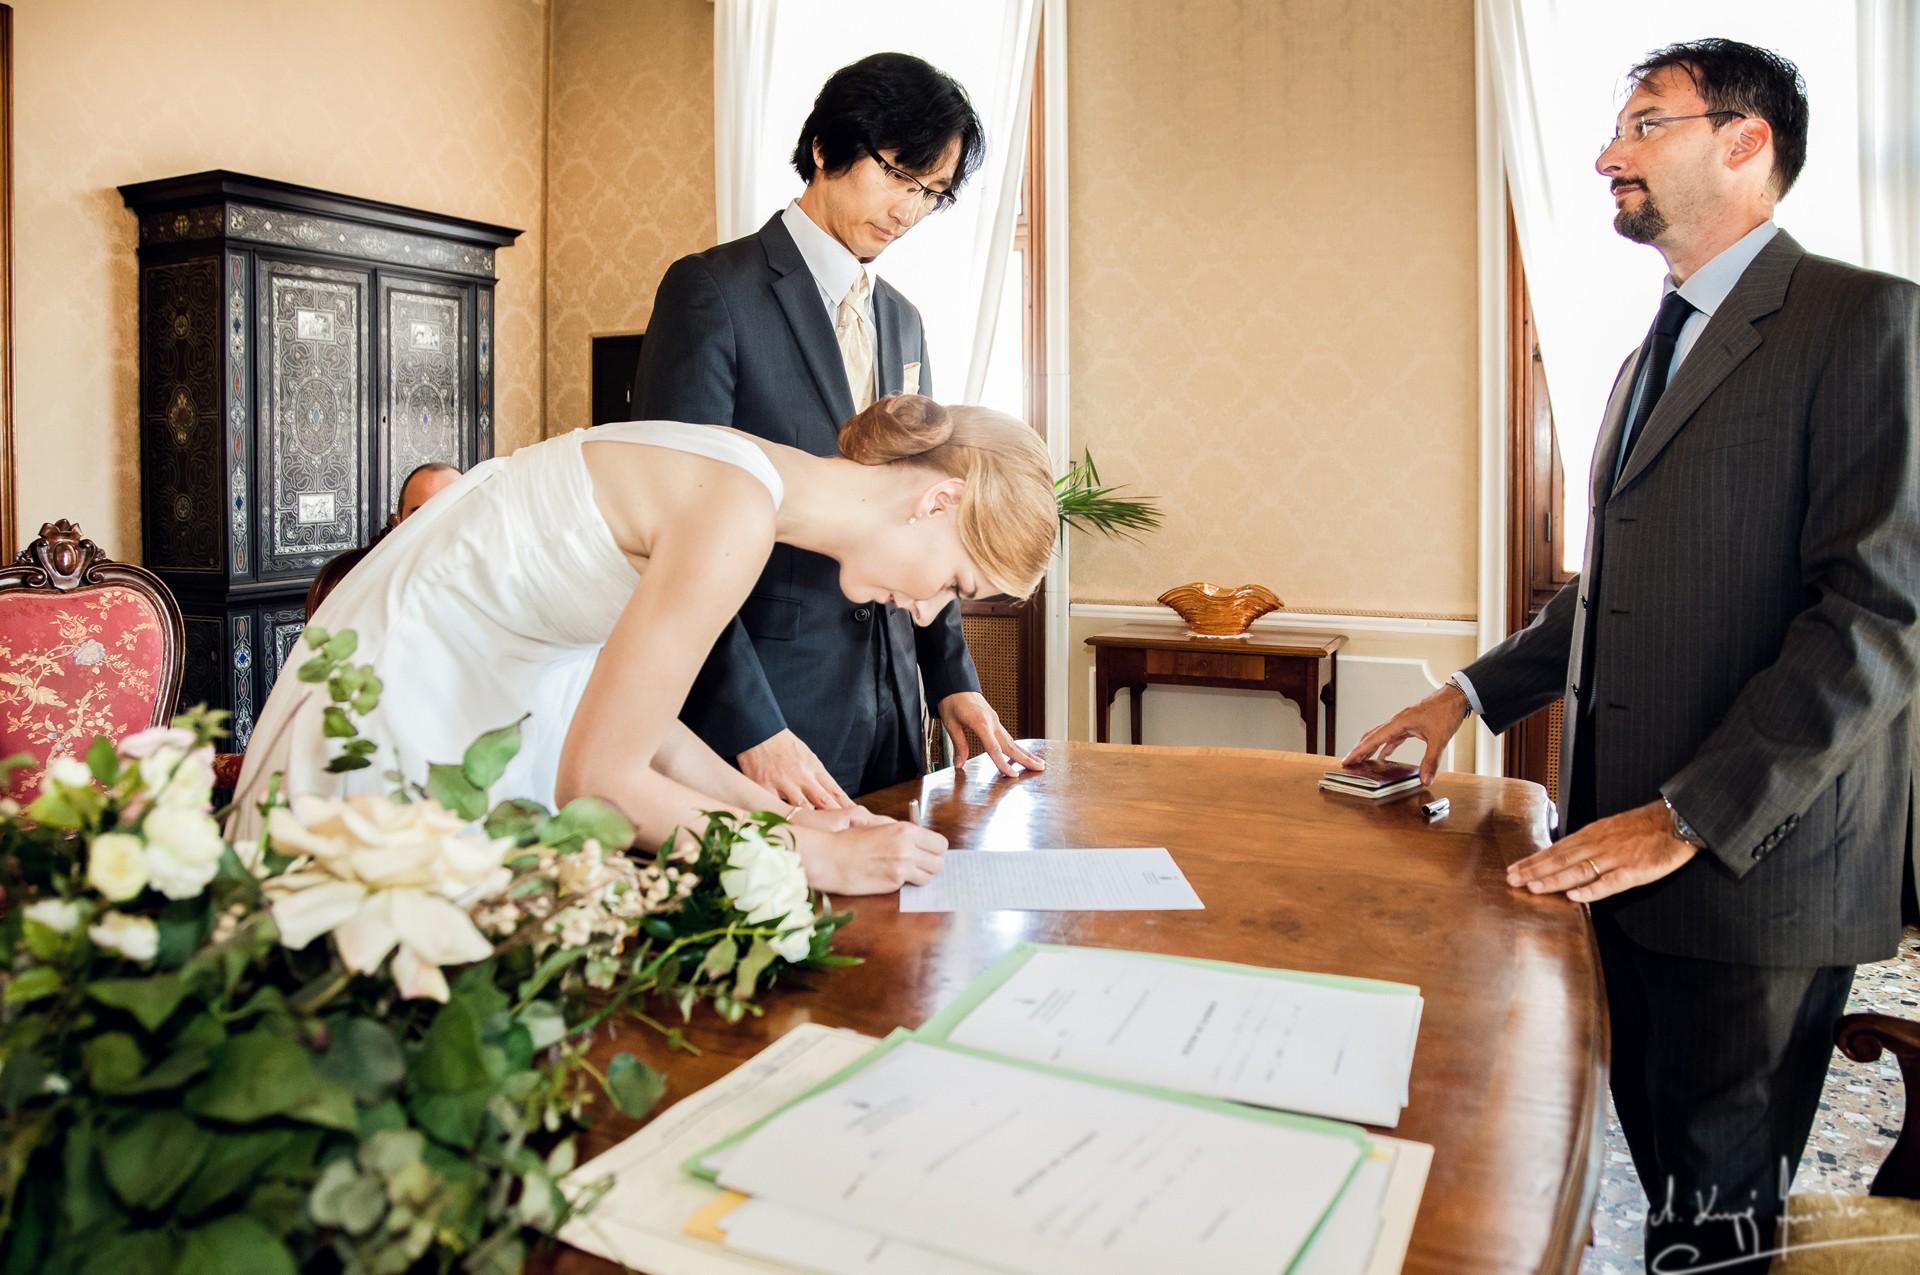 Ślub w wenecji 25 Manuela Luiza & Young Seon Song